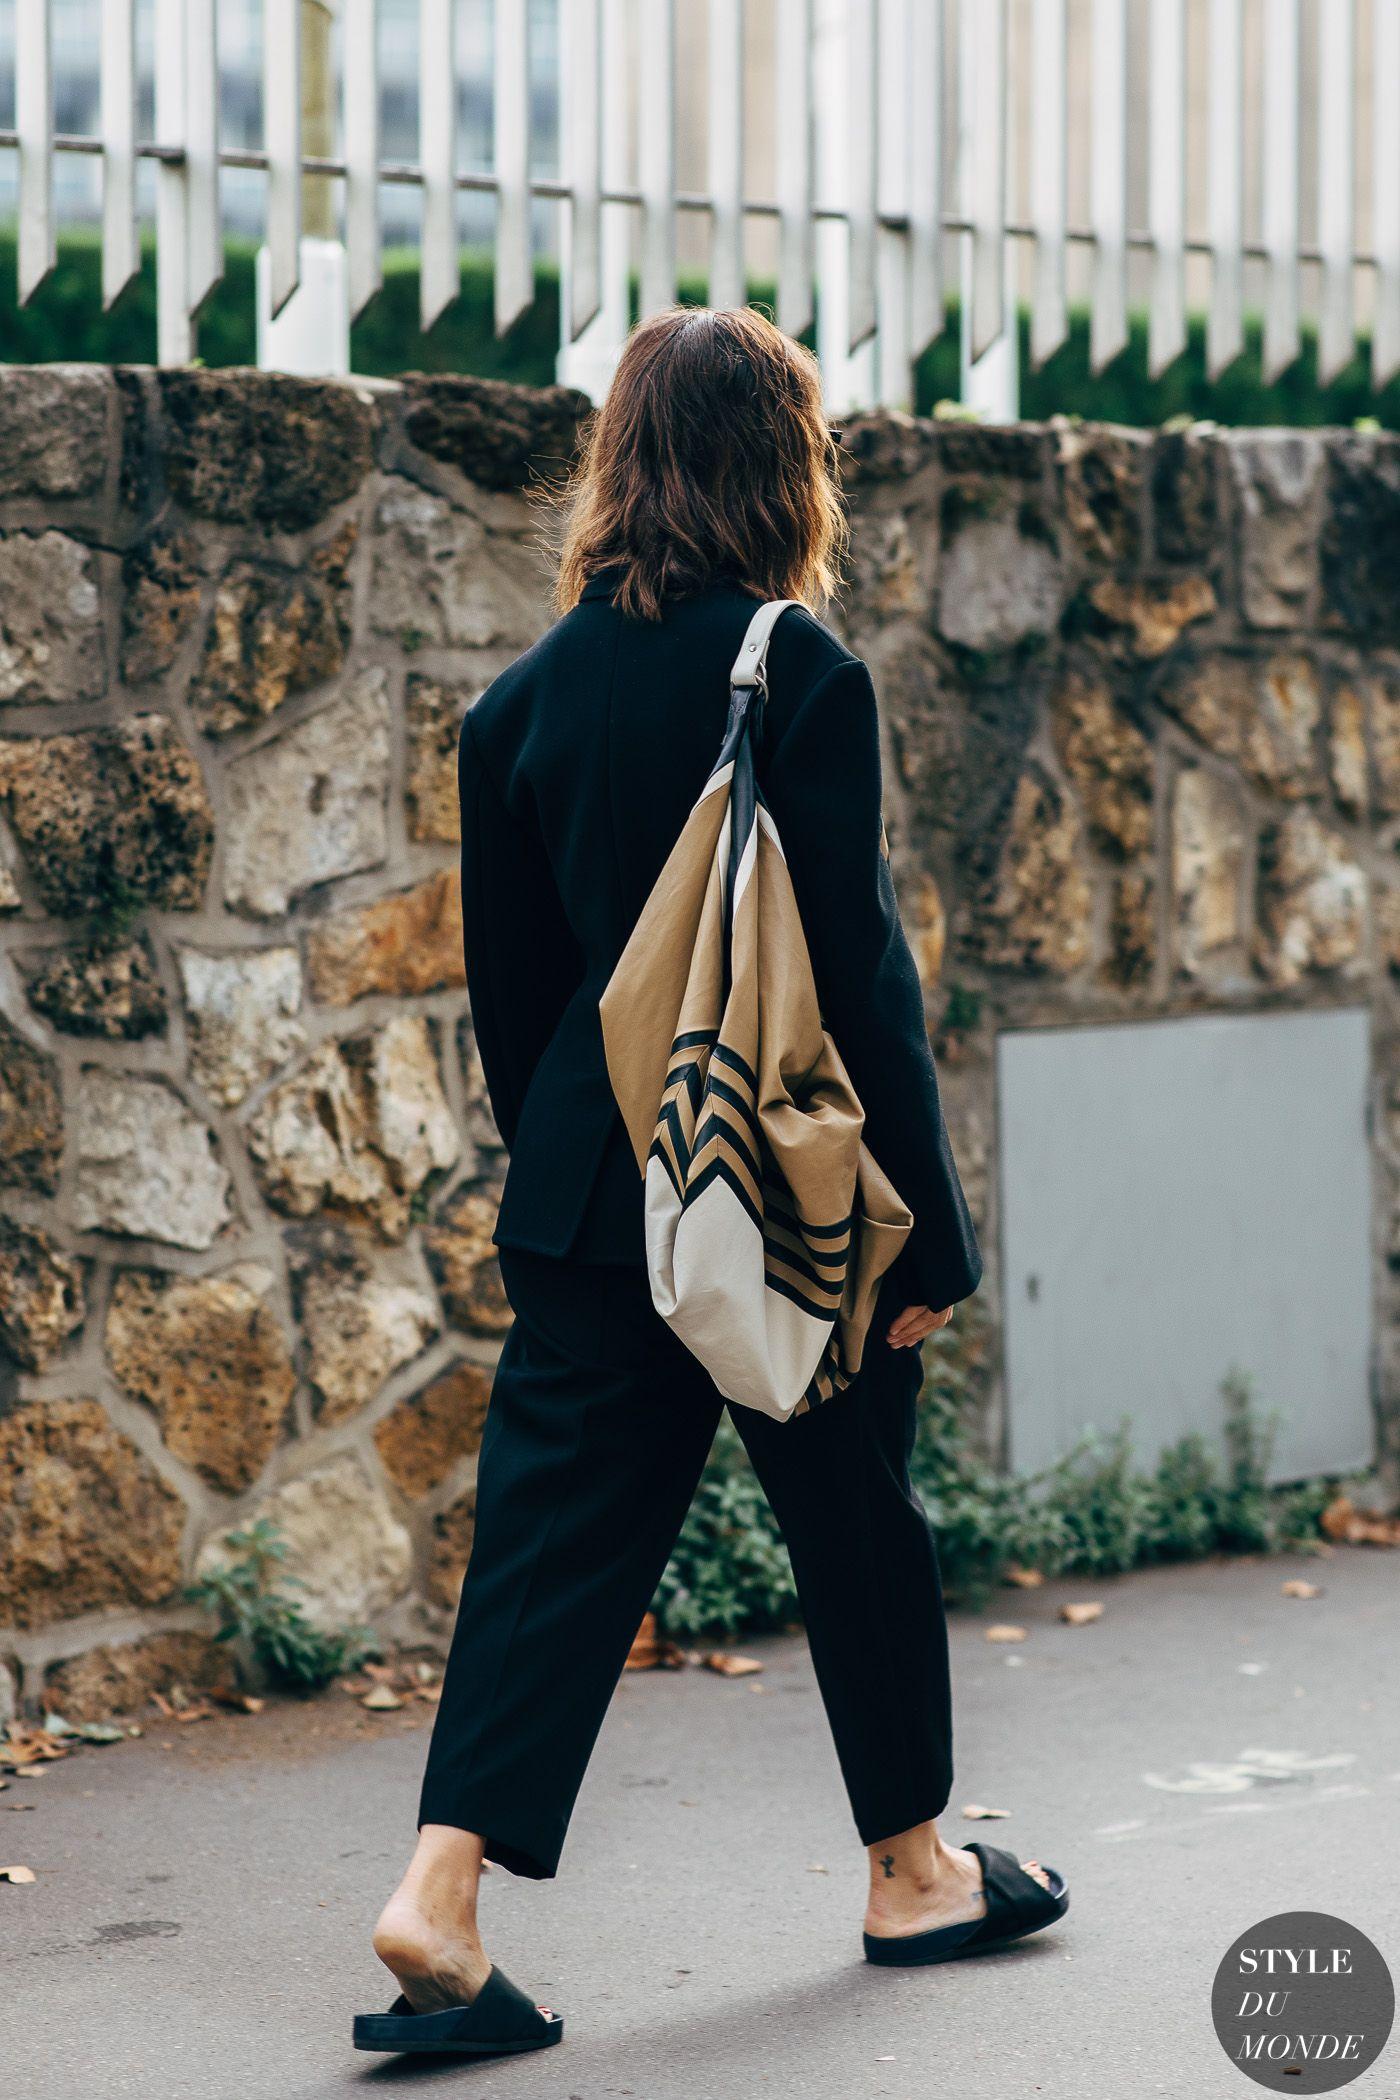 Paris SS 2019 Street Style: Natasha Goldenberg (STYLE DU MONDE) #mensstreetstylesummer